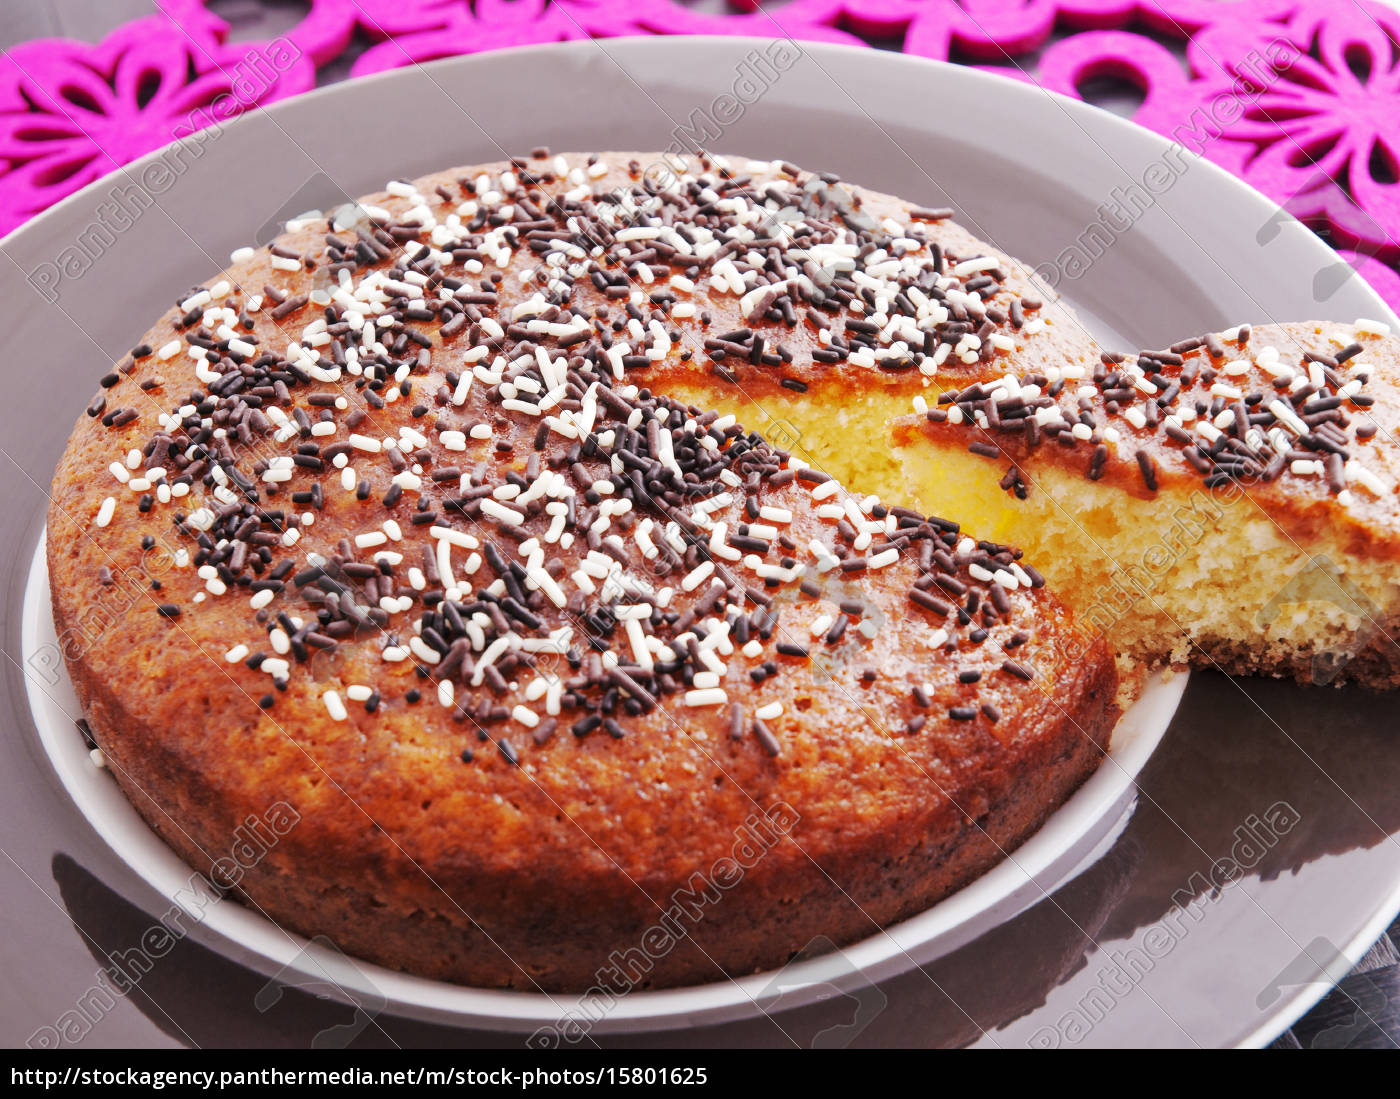 homemade, cake, homemade, cake - 15801625